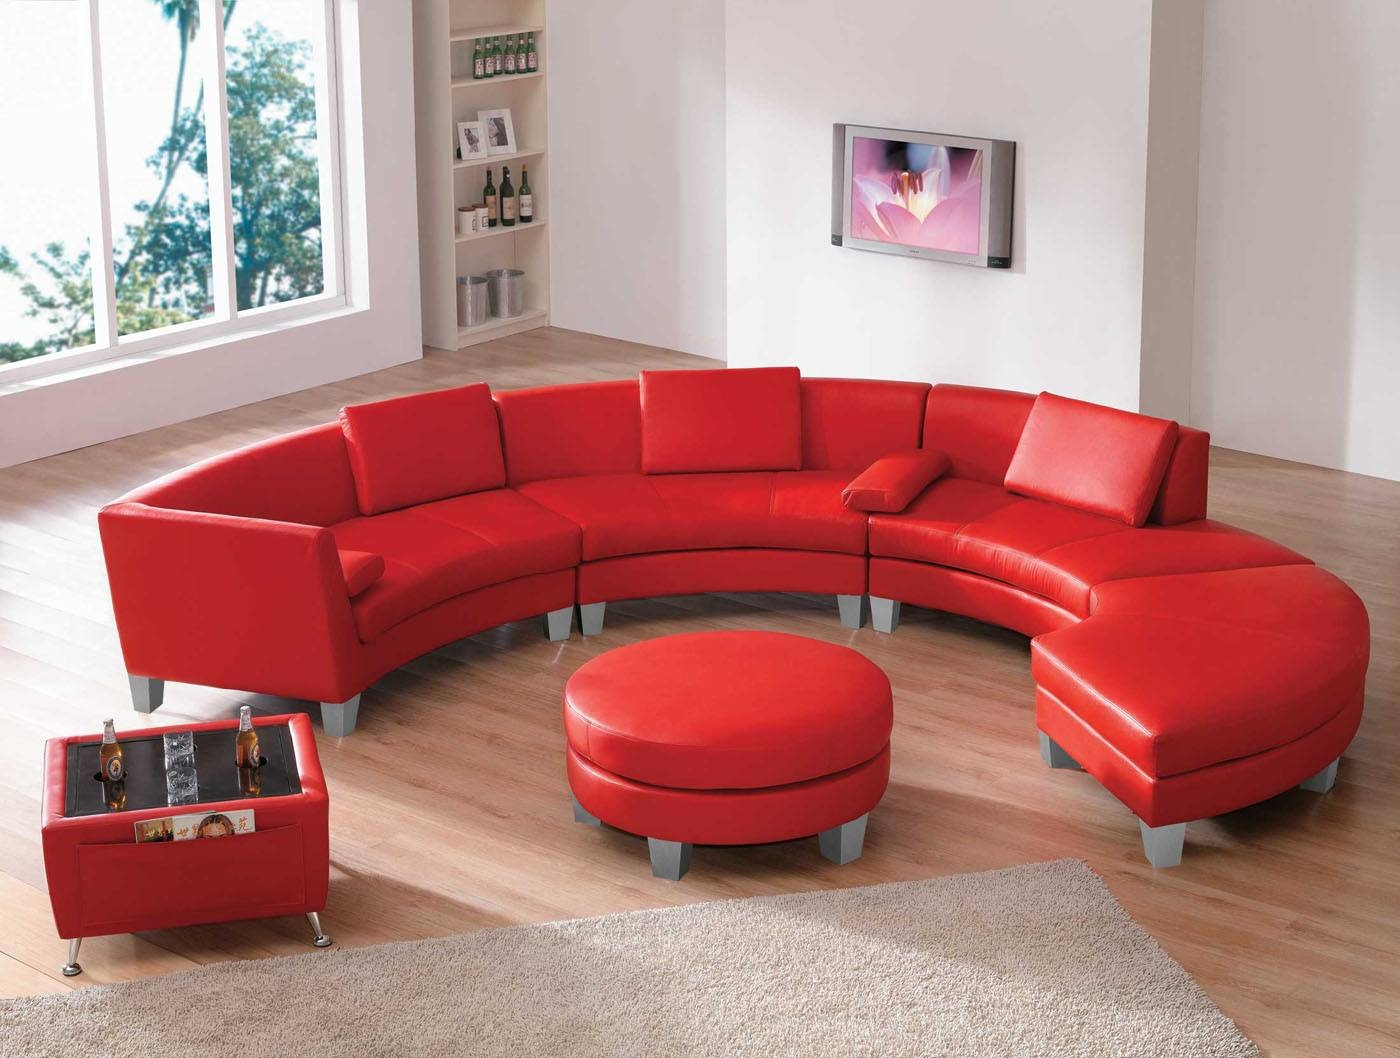 Sofa : Cheap Cool Sofas Home Design Image Contemporary To Cheap within Cool Cheap Sofas (Image 21 of 30)